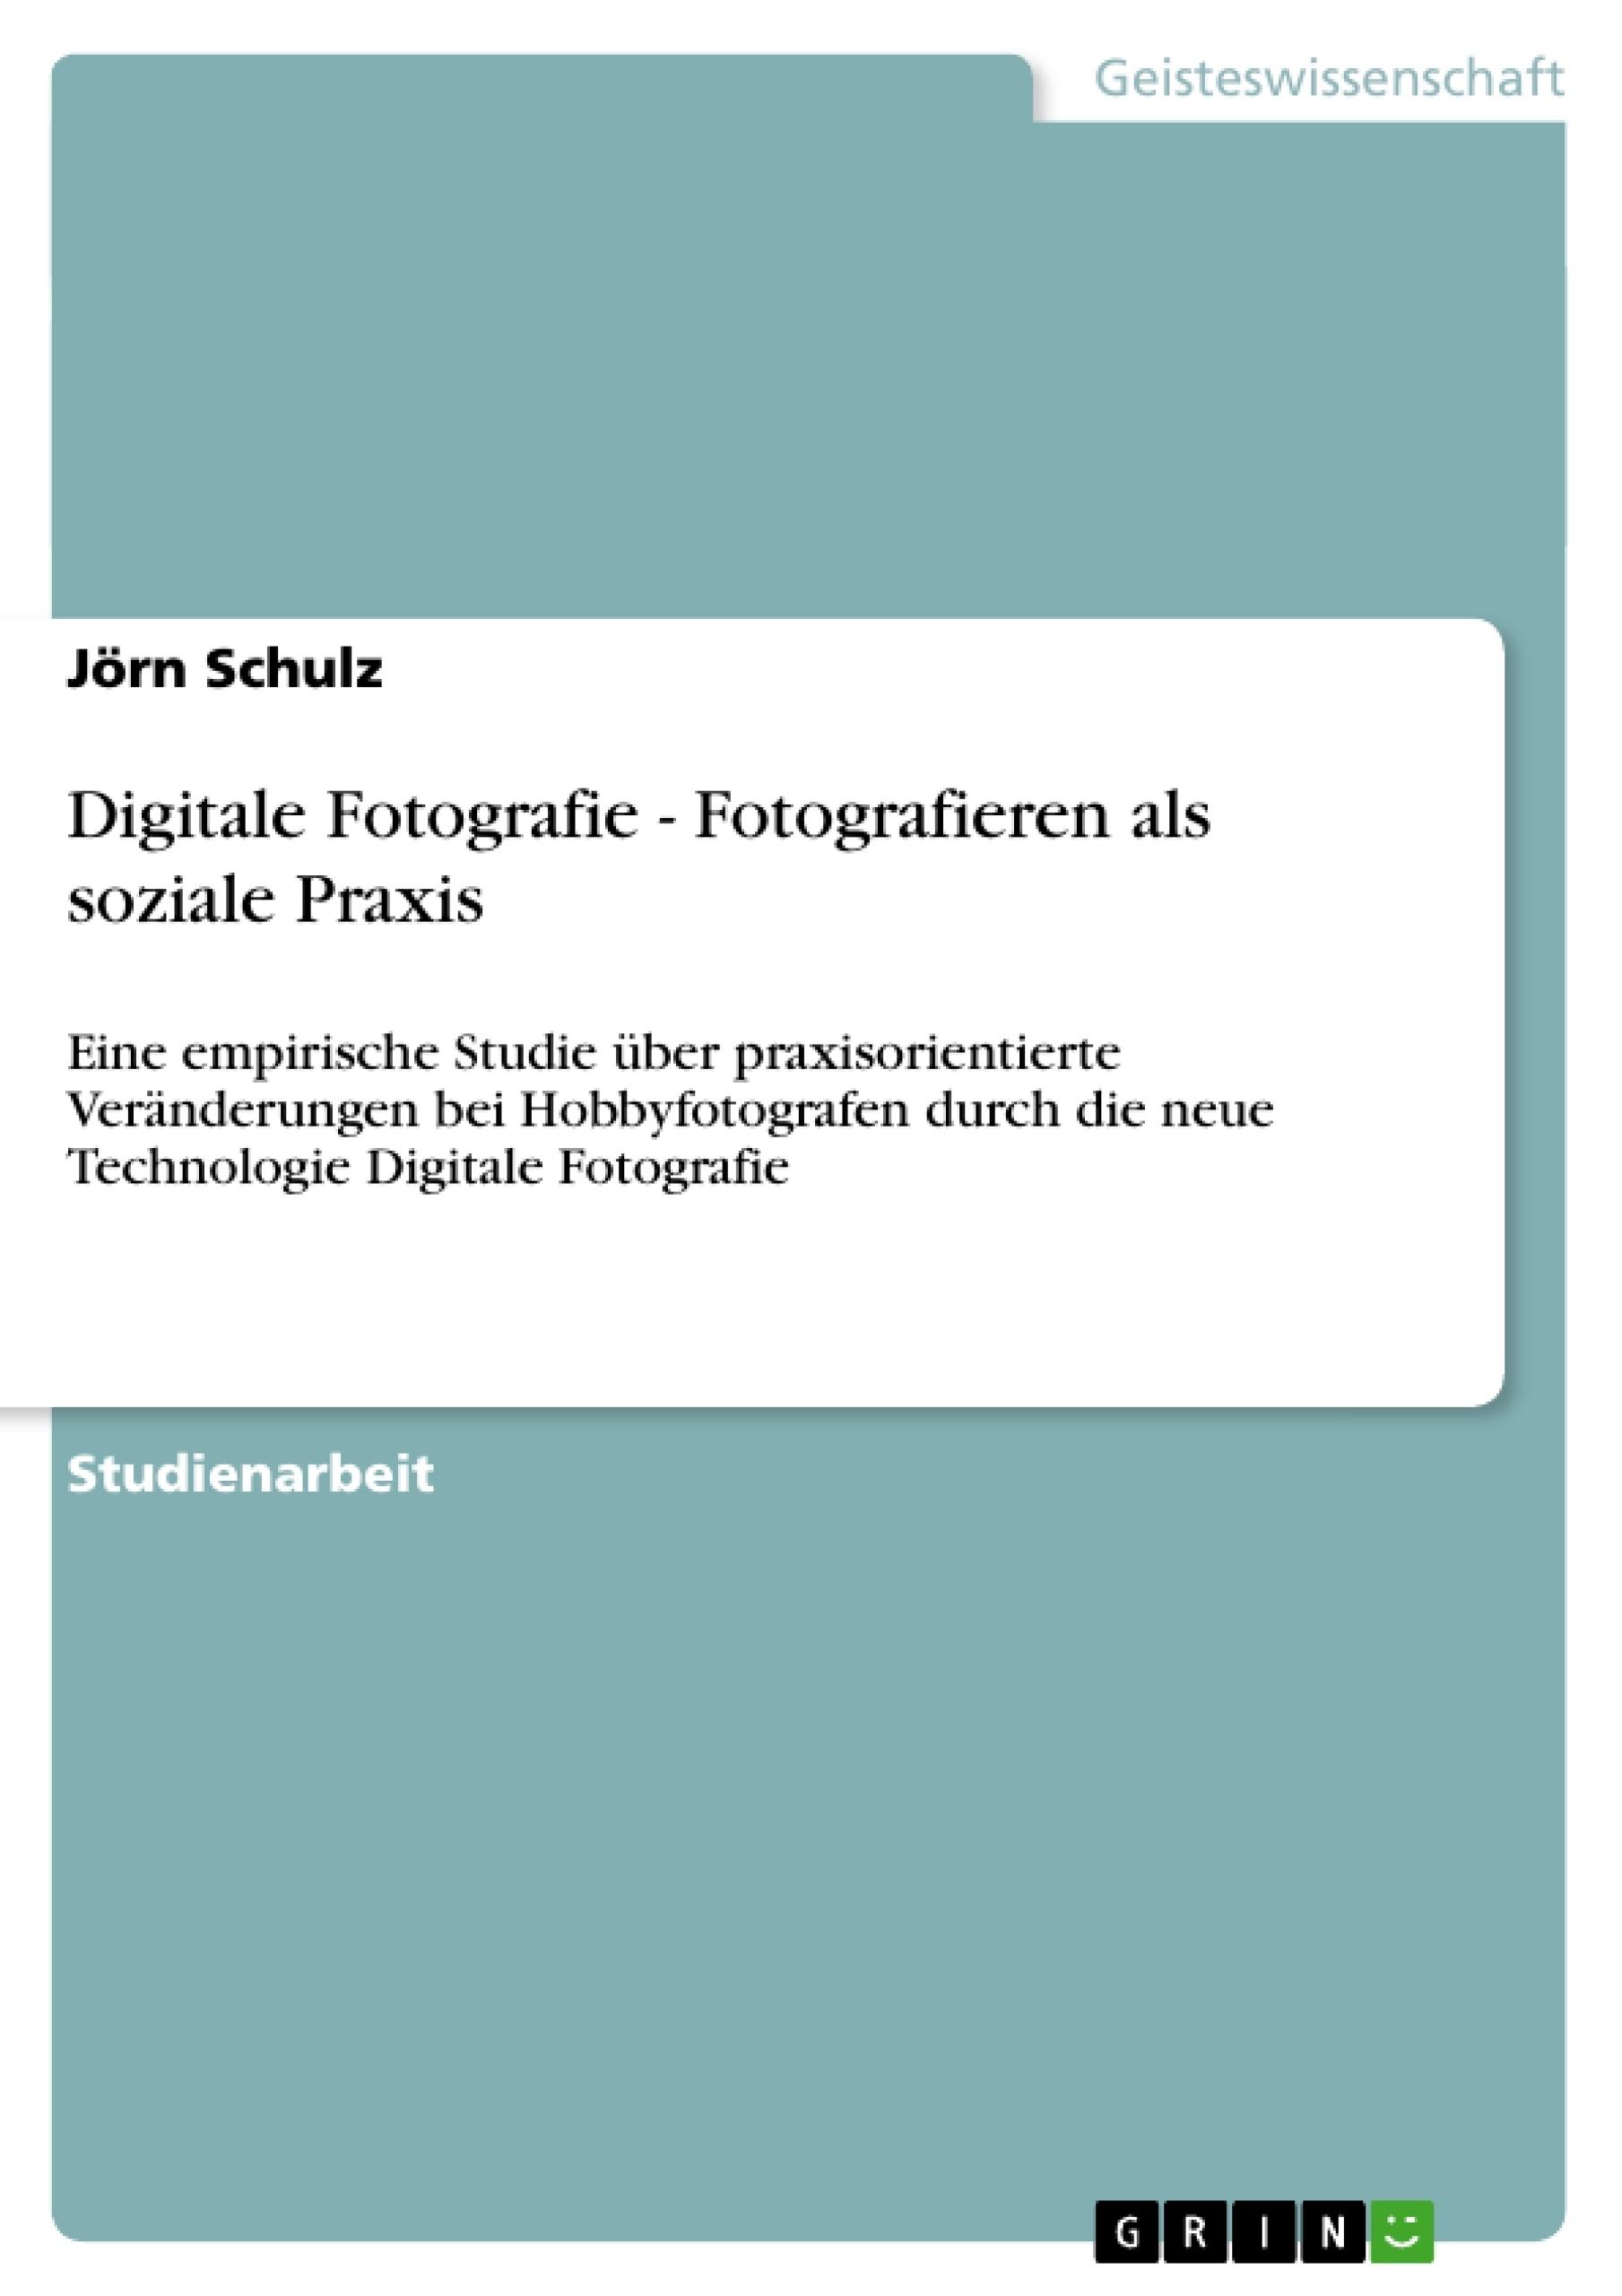 Titel: Digitale Fotografie - Fotografieren als soziale Praxis